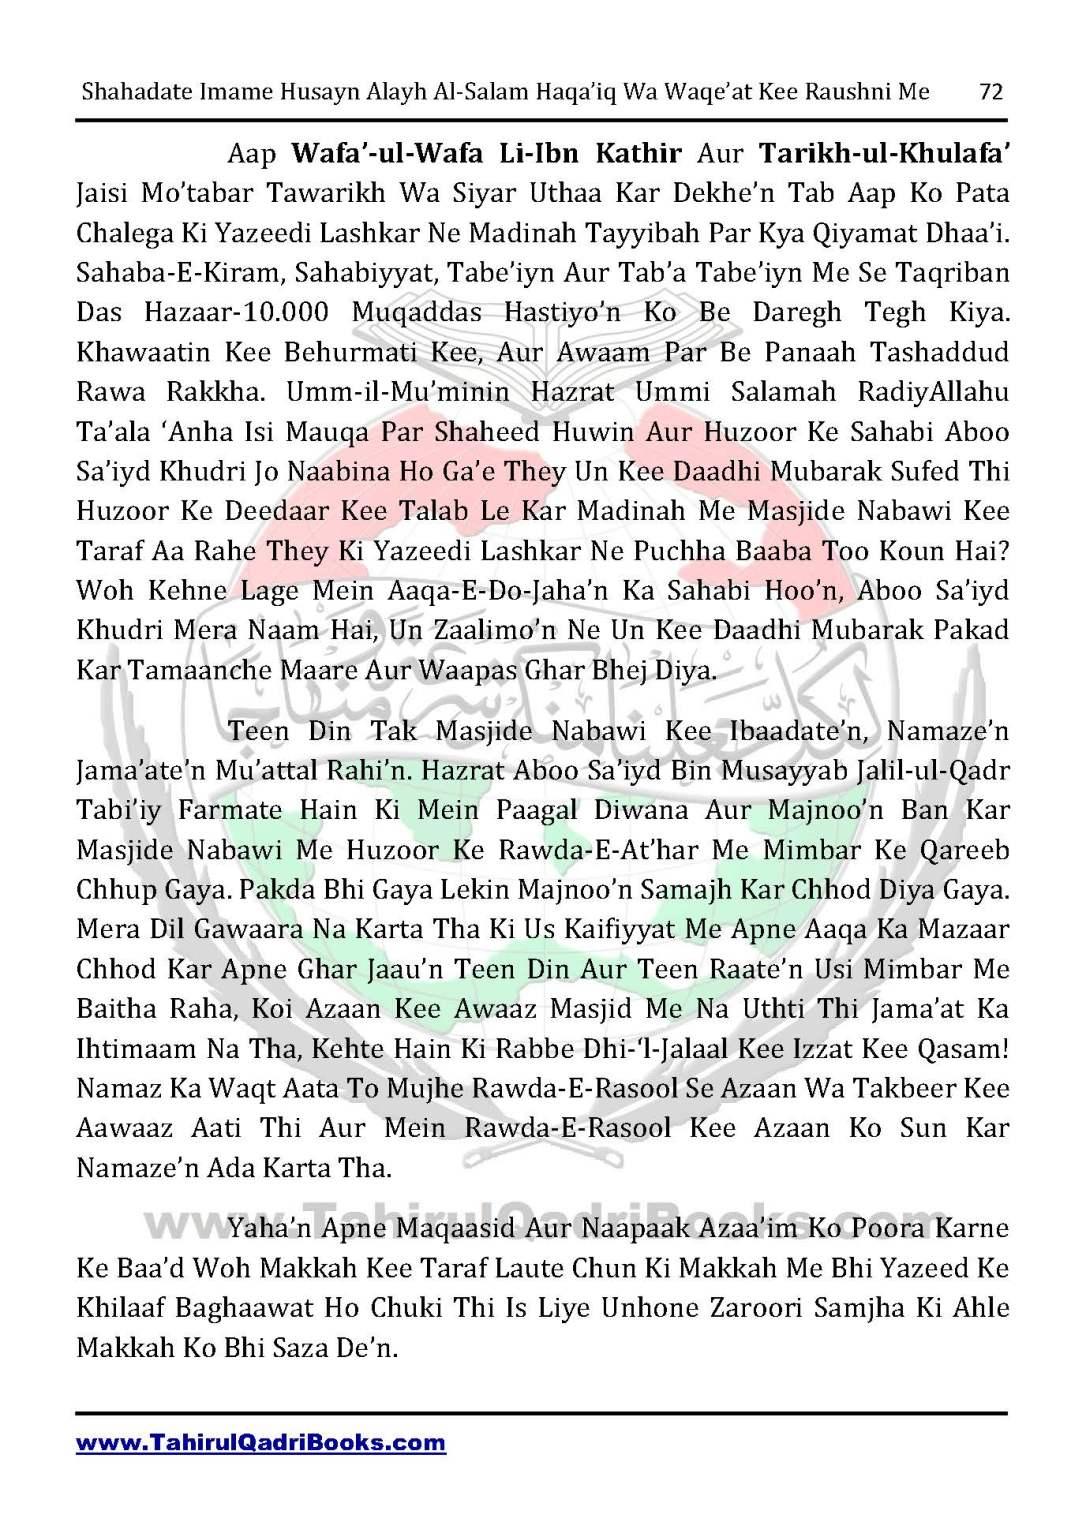 shahadate-imame-husayn-alayh-is-salam-haqaiq-wa-waqe_at-kee-raushni-me-in-roman-urdu-unlocked_Page_72